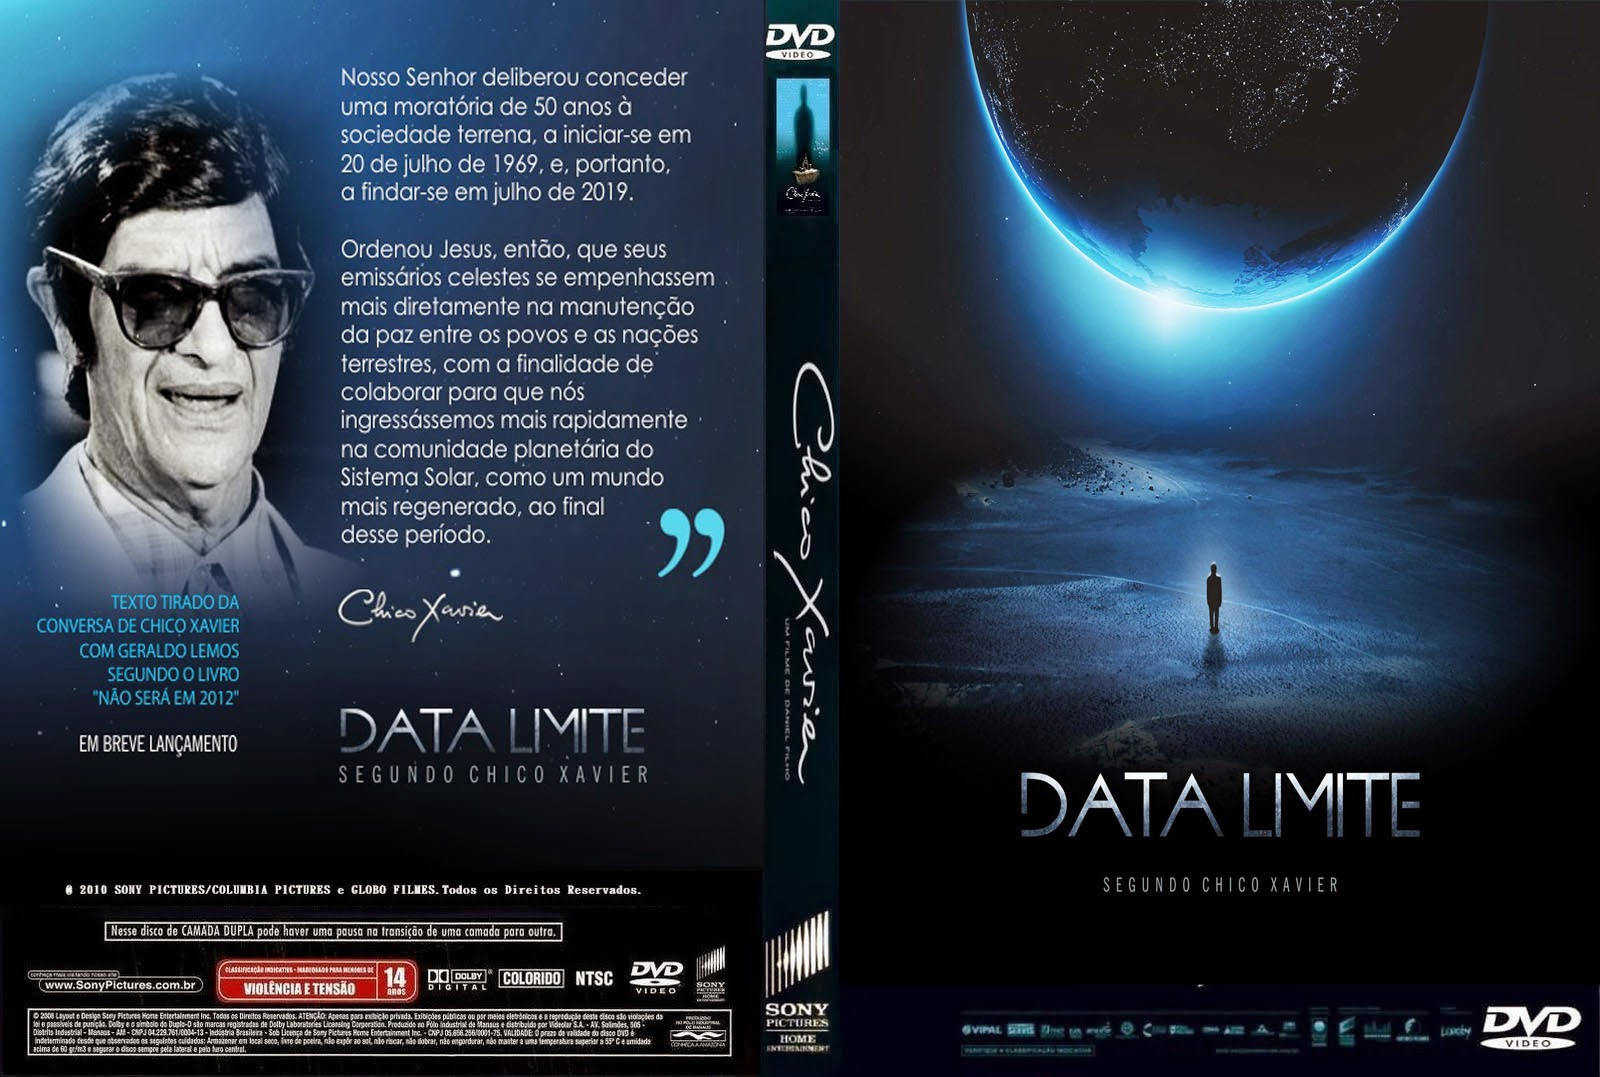 Baixar Data Limite Segundo Chico Xavier DVDRip XviD Nacional Data 2BLimite 2C 2BSegundo 2BChico 2BXavier 2BXANDAODOWNLOAD